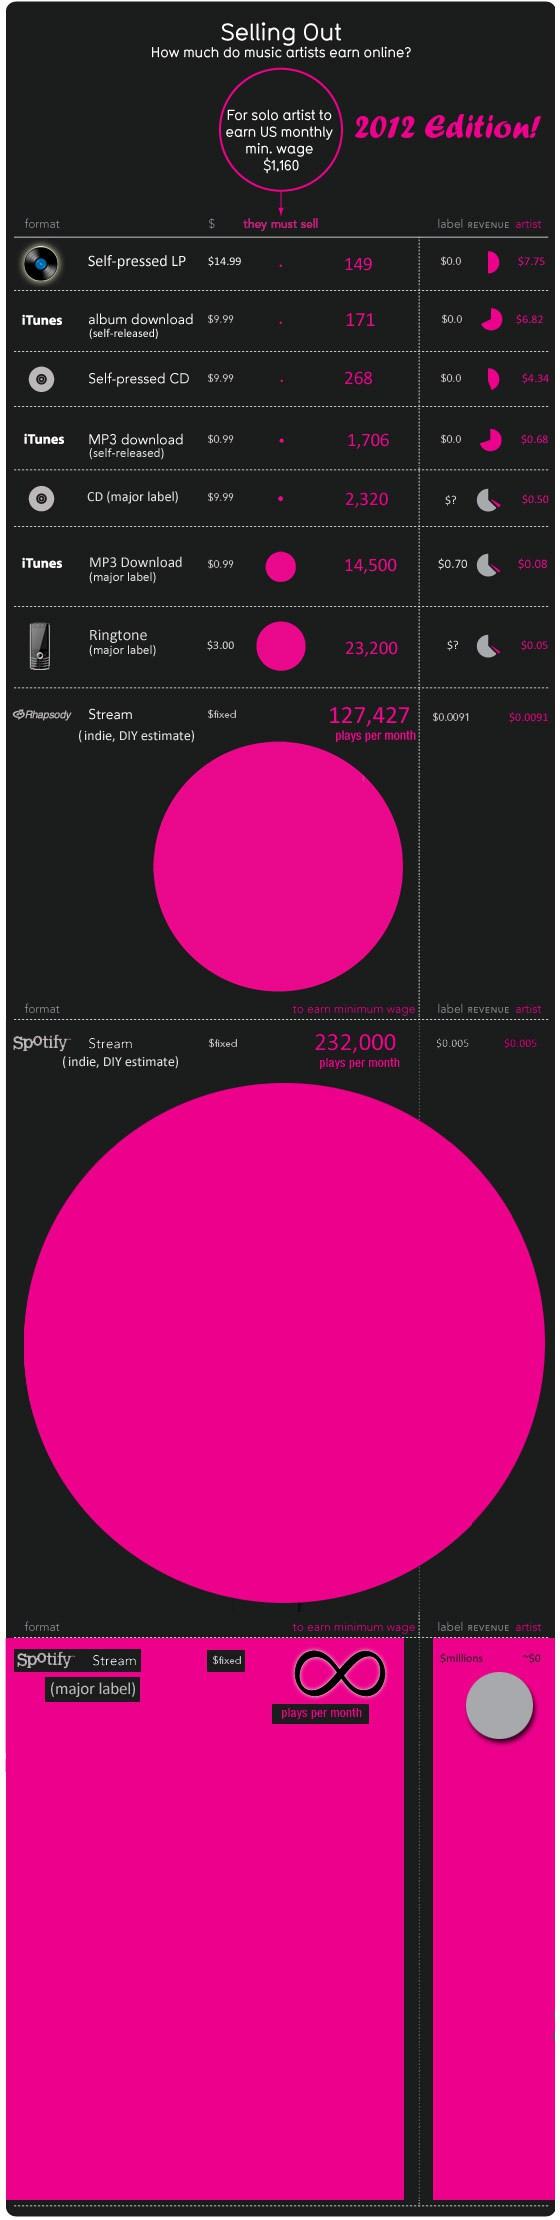 How much do artist earn online?